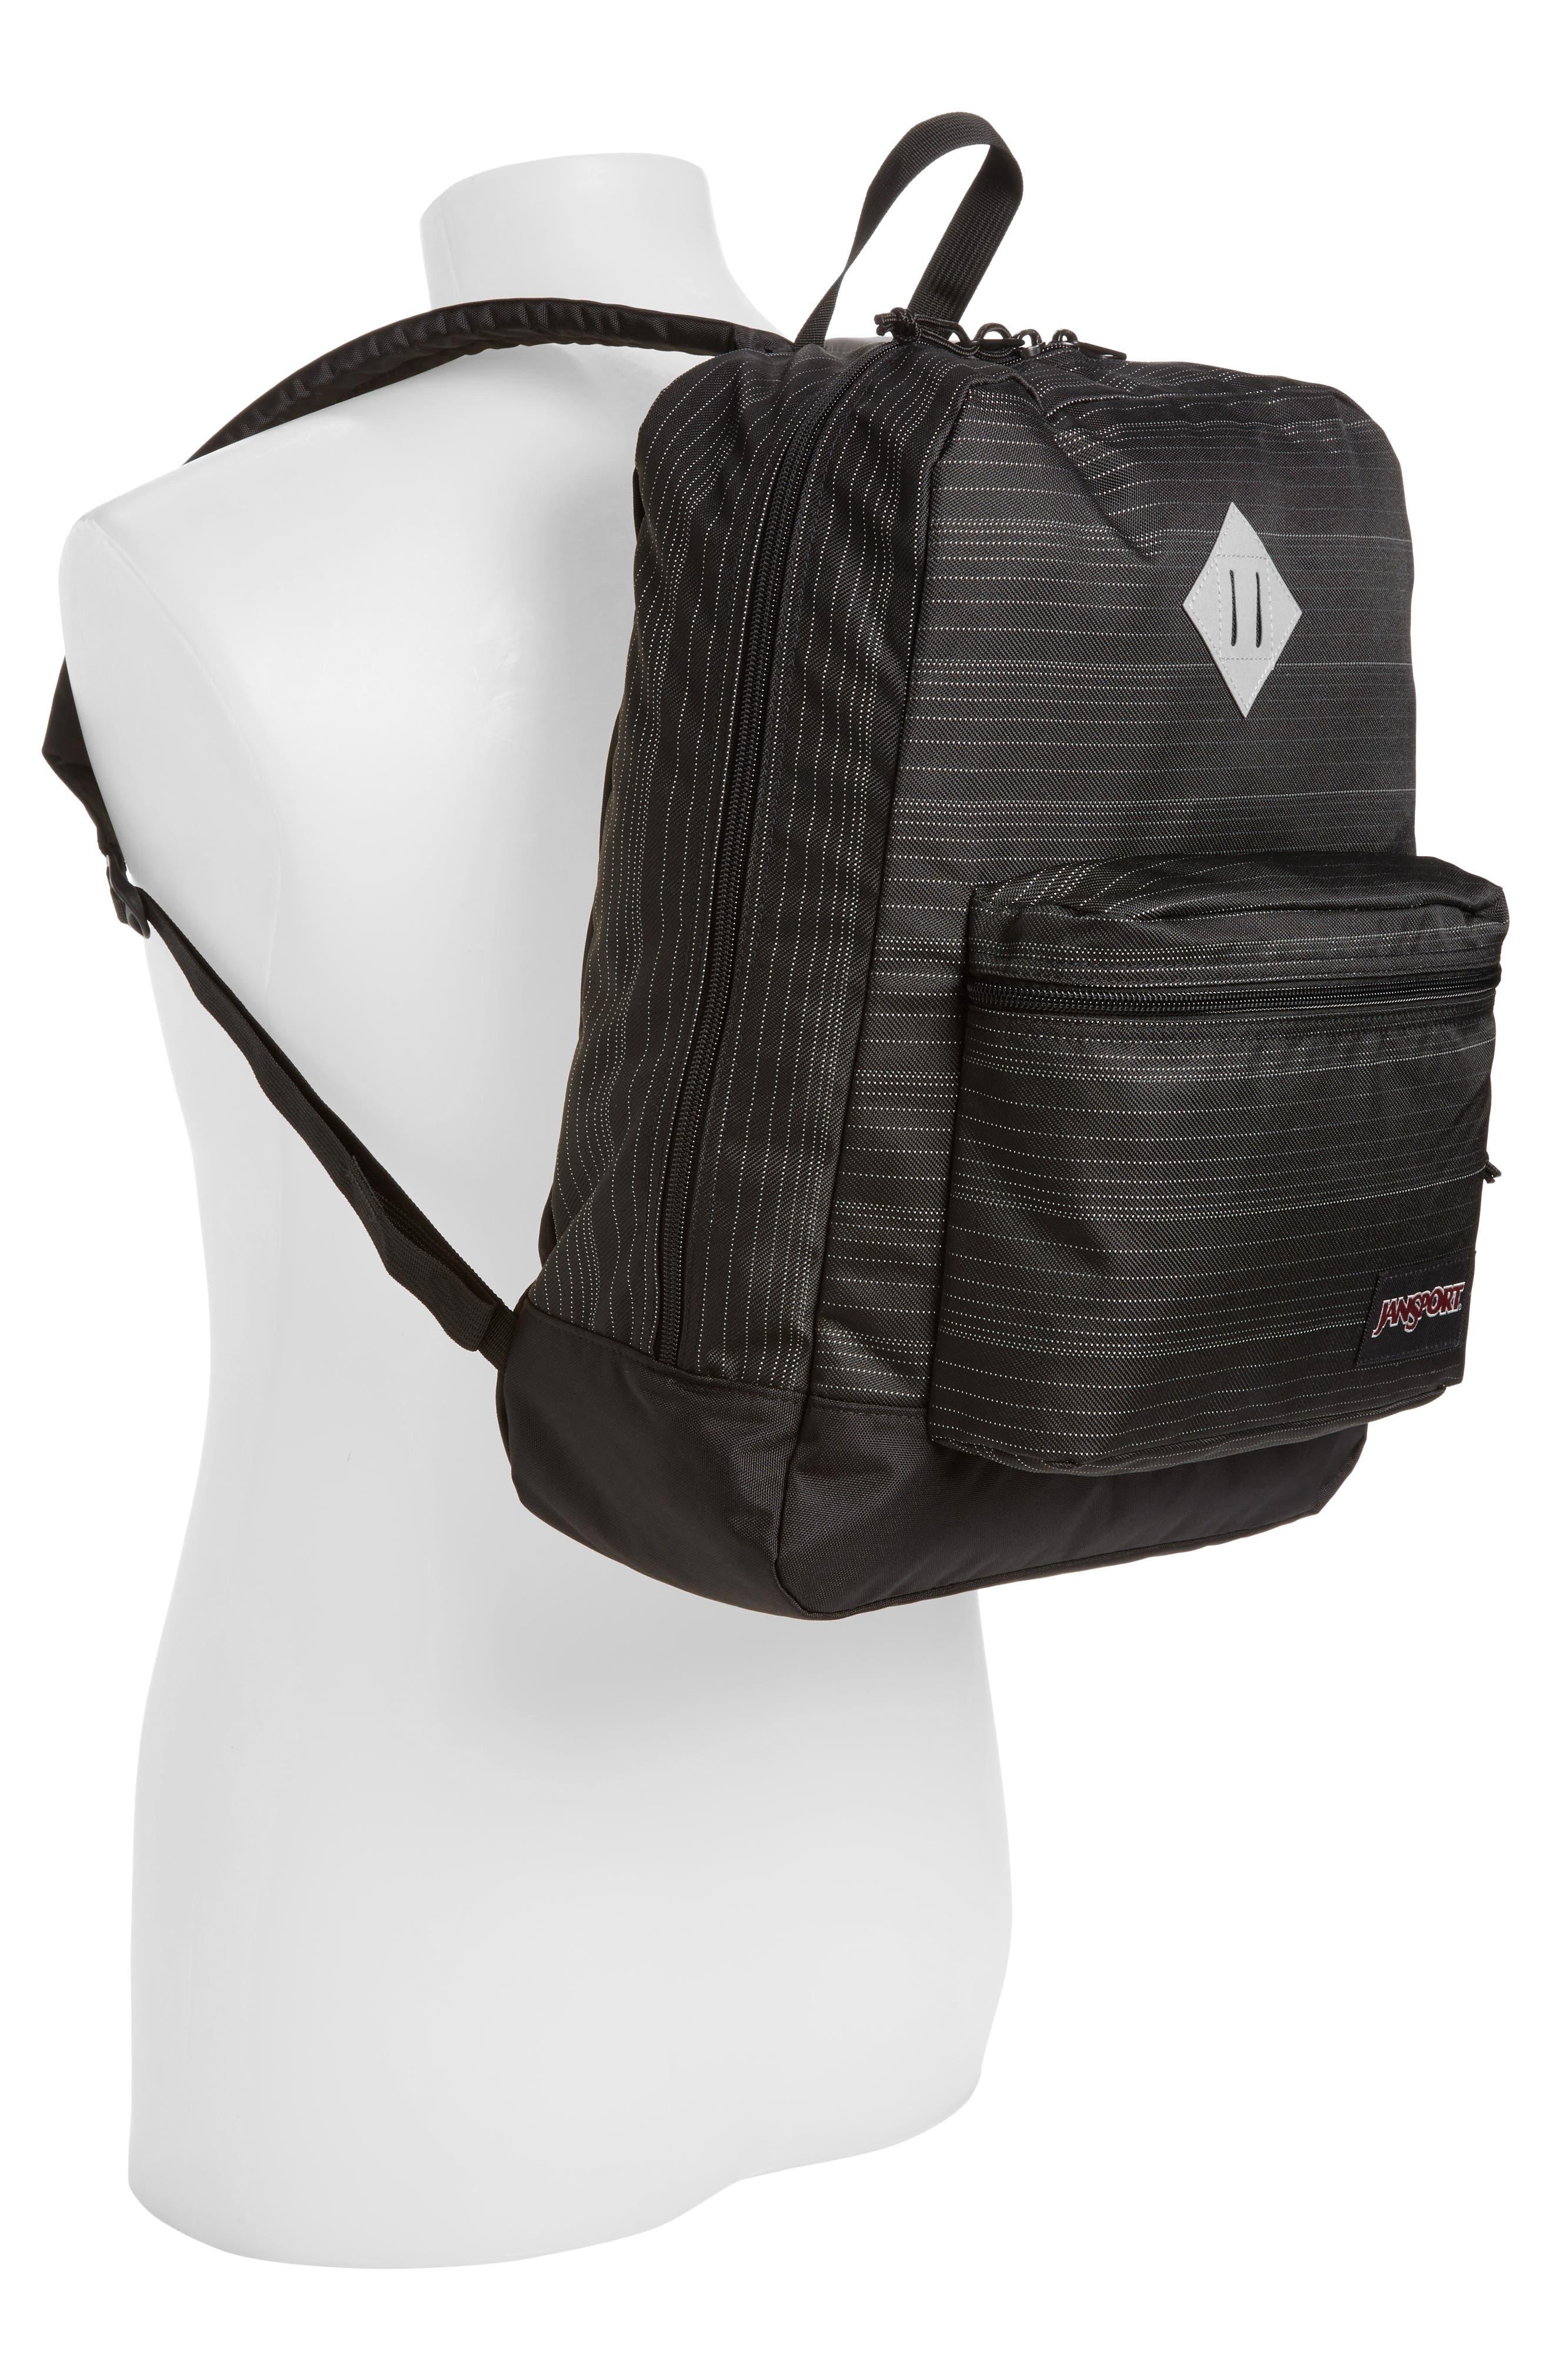 Super FX Reflective Backpack,                             Alternate thumbnail 2, color,                             020